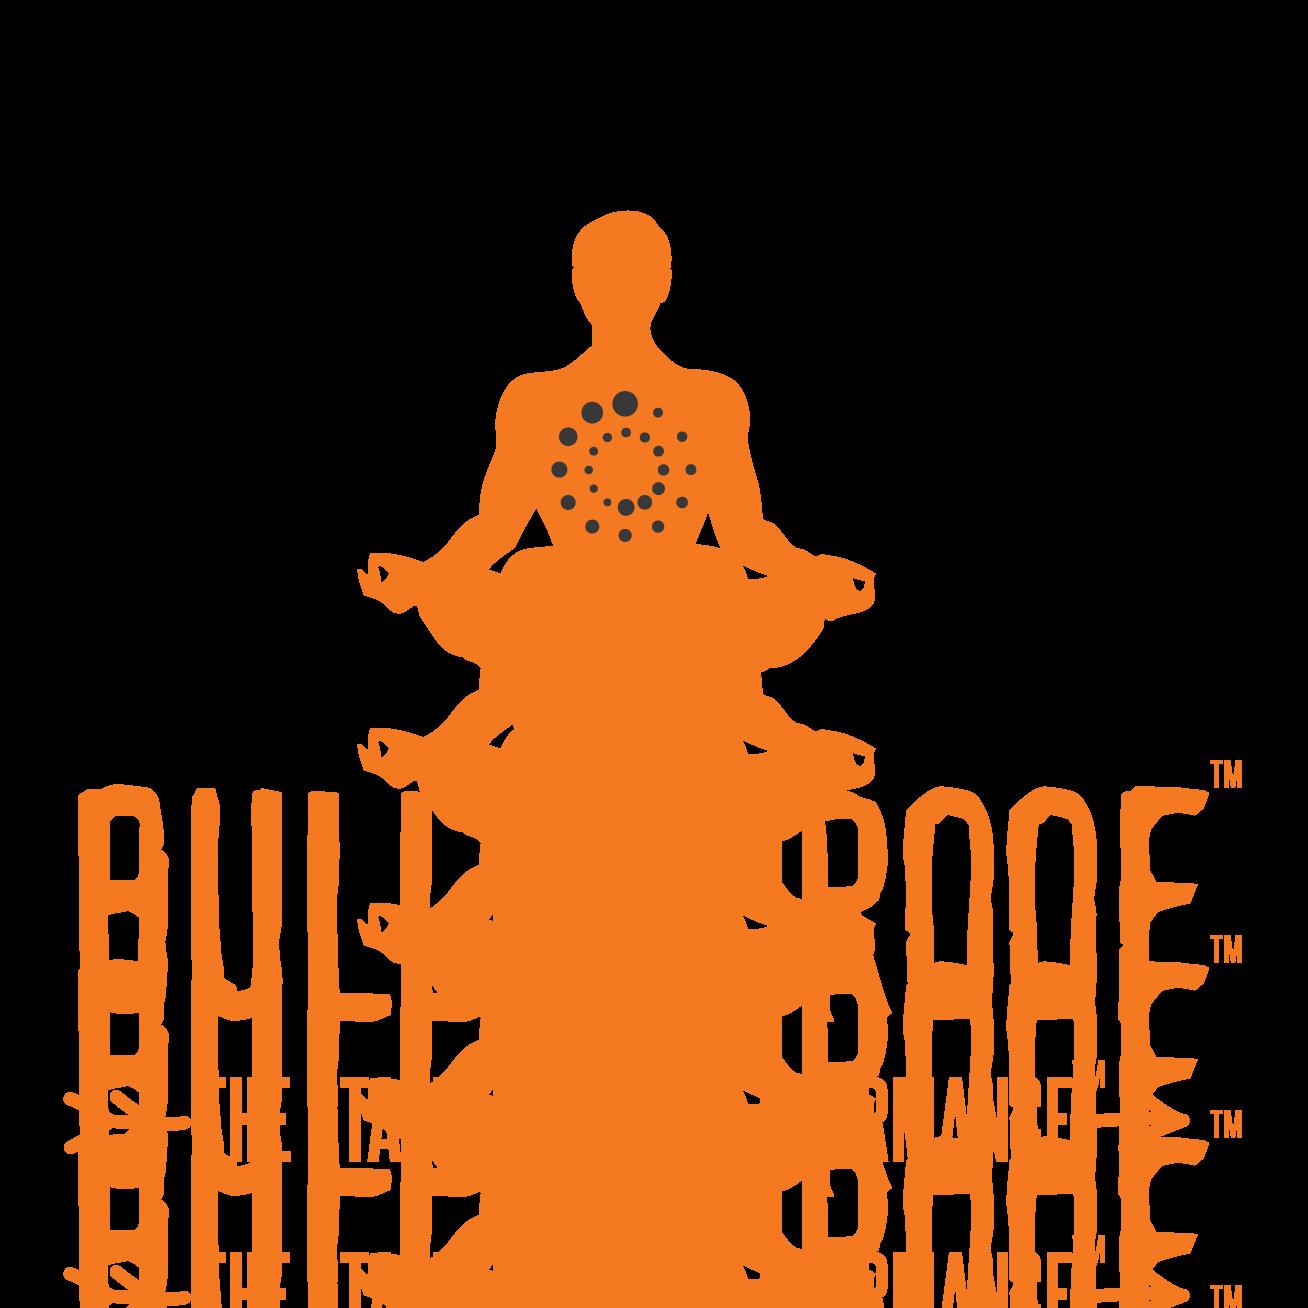 BULLETPROOF_LOGO_2_Tagline.png